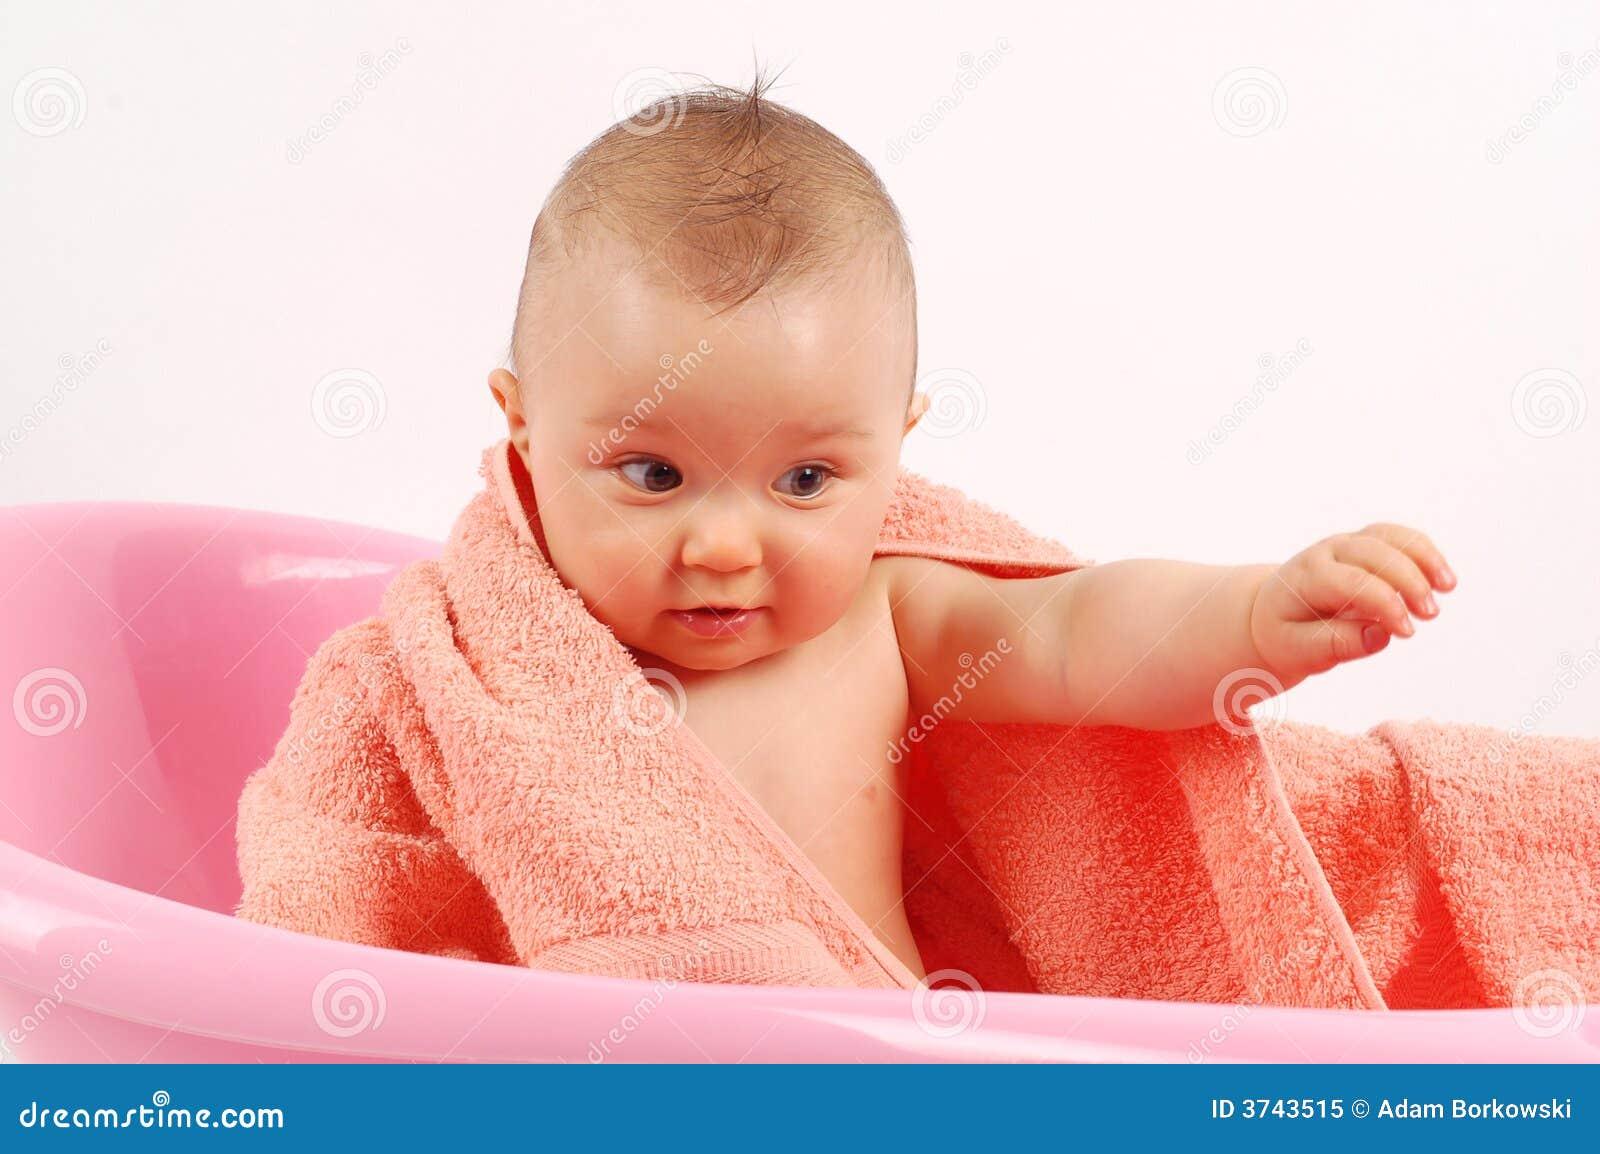 baby bath 16 royalty free stock photo image 3743515. Black Bedroom Furniture Sets. Home Design Ideas